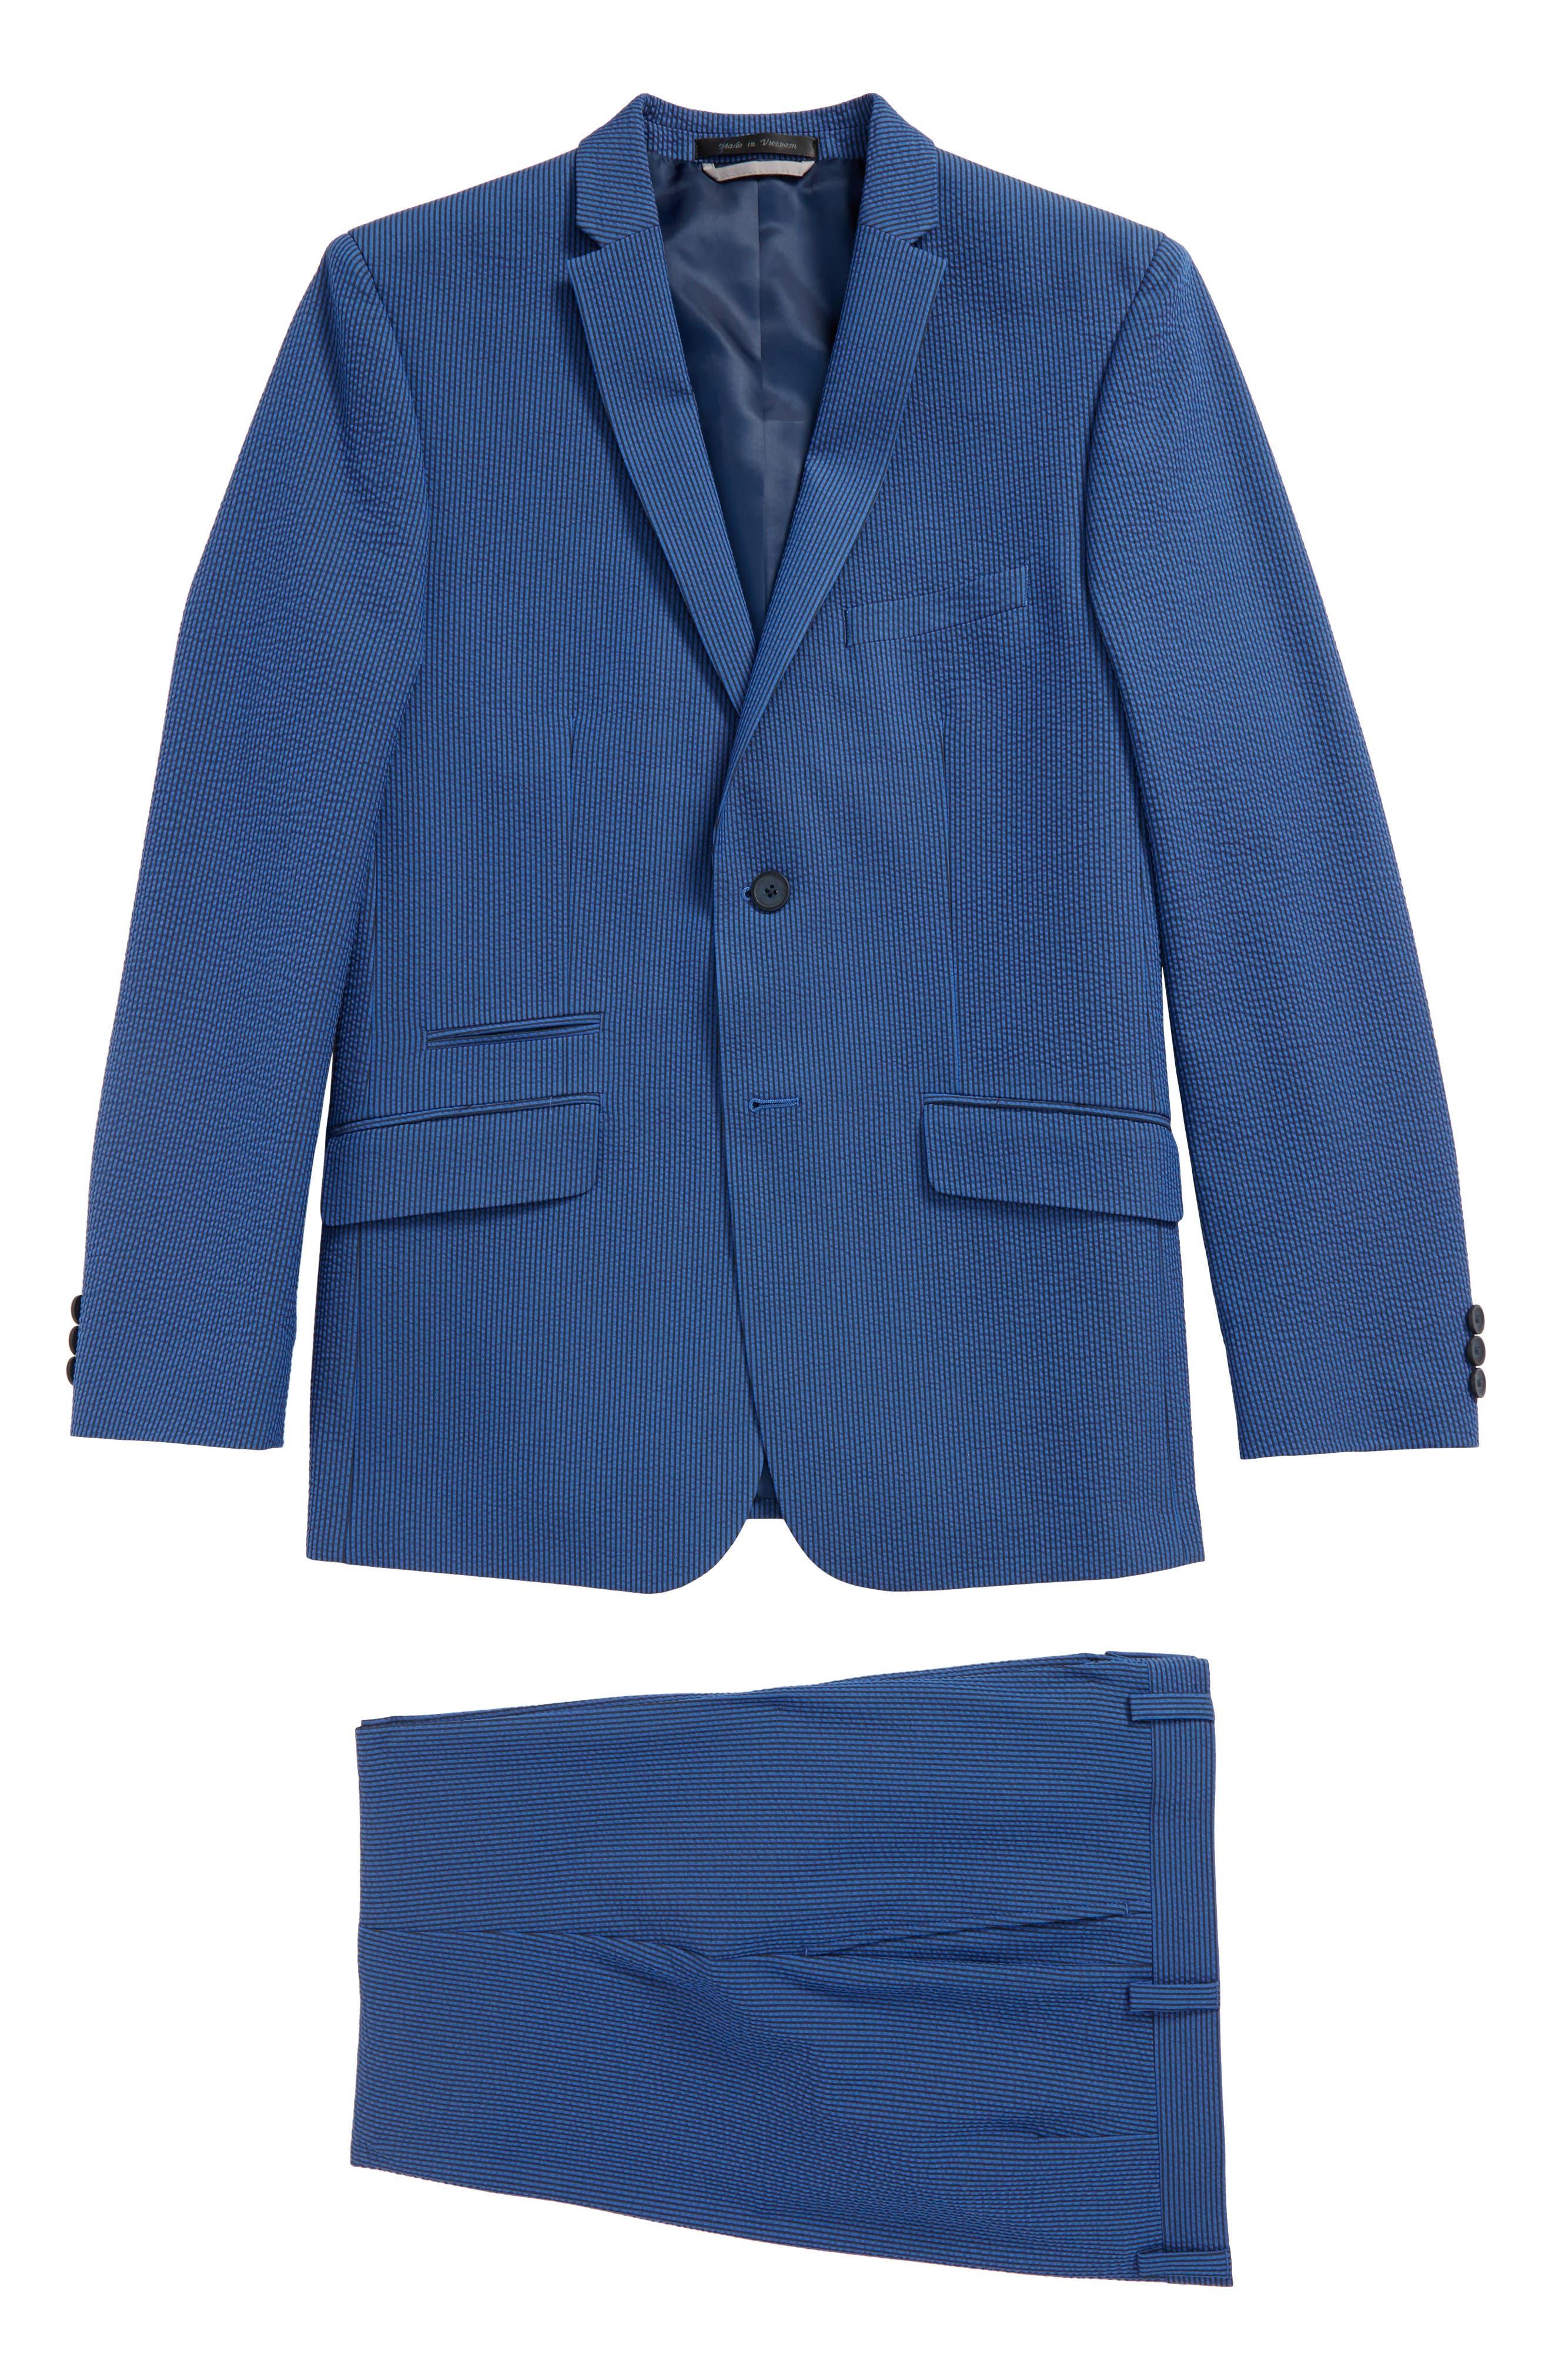 Andrew Marc Skinny Fit Suit (Big Boys)